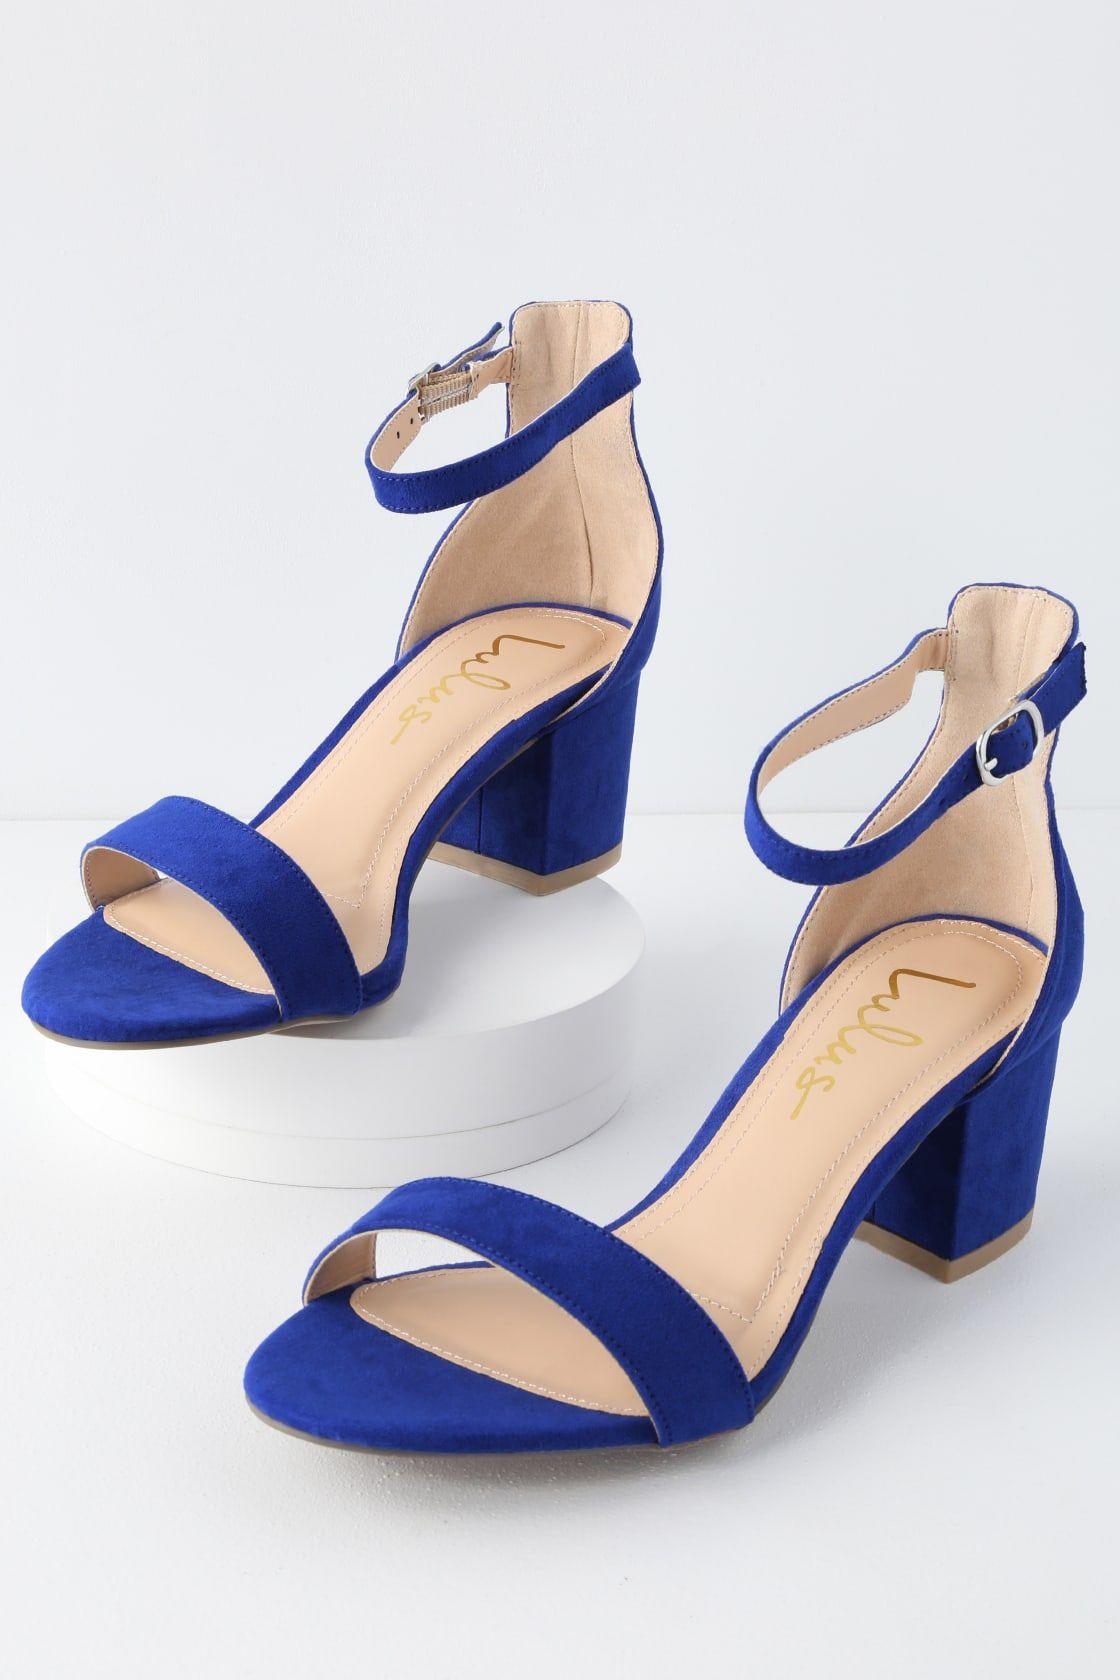 613057ae25 Harper Cobalt Blue Ankle Strap Heels in 2019   Blue shoes   Heels ...